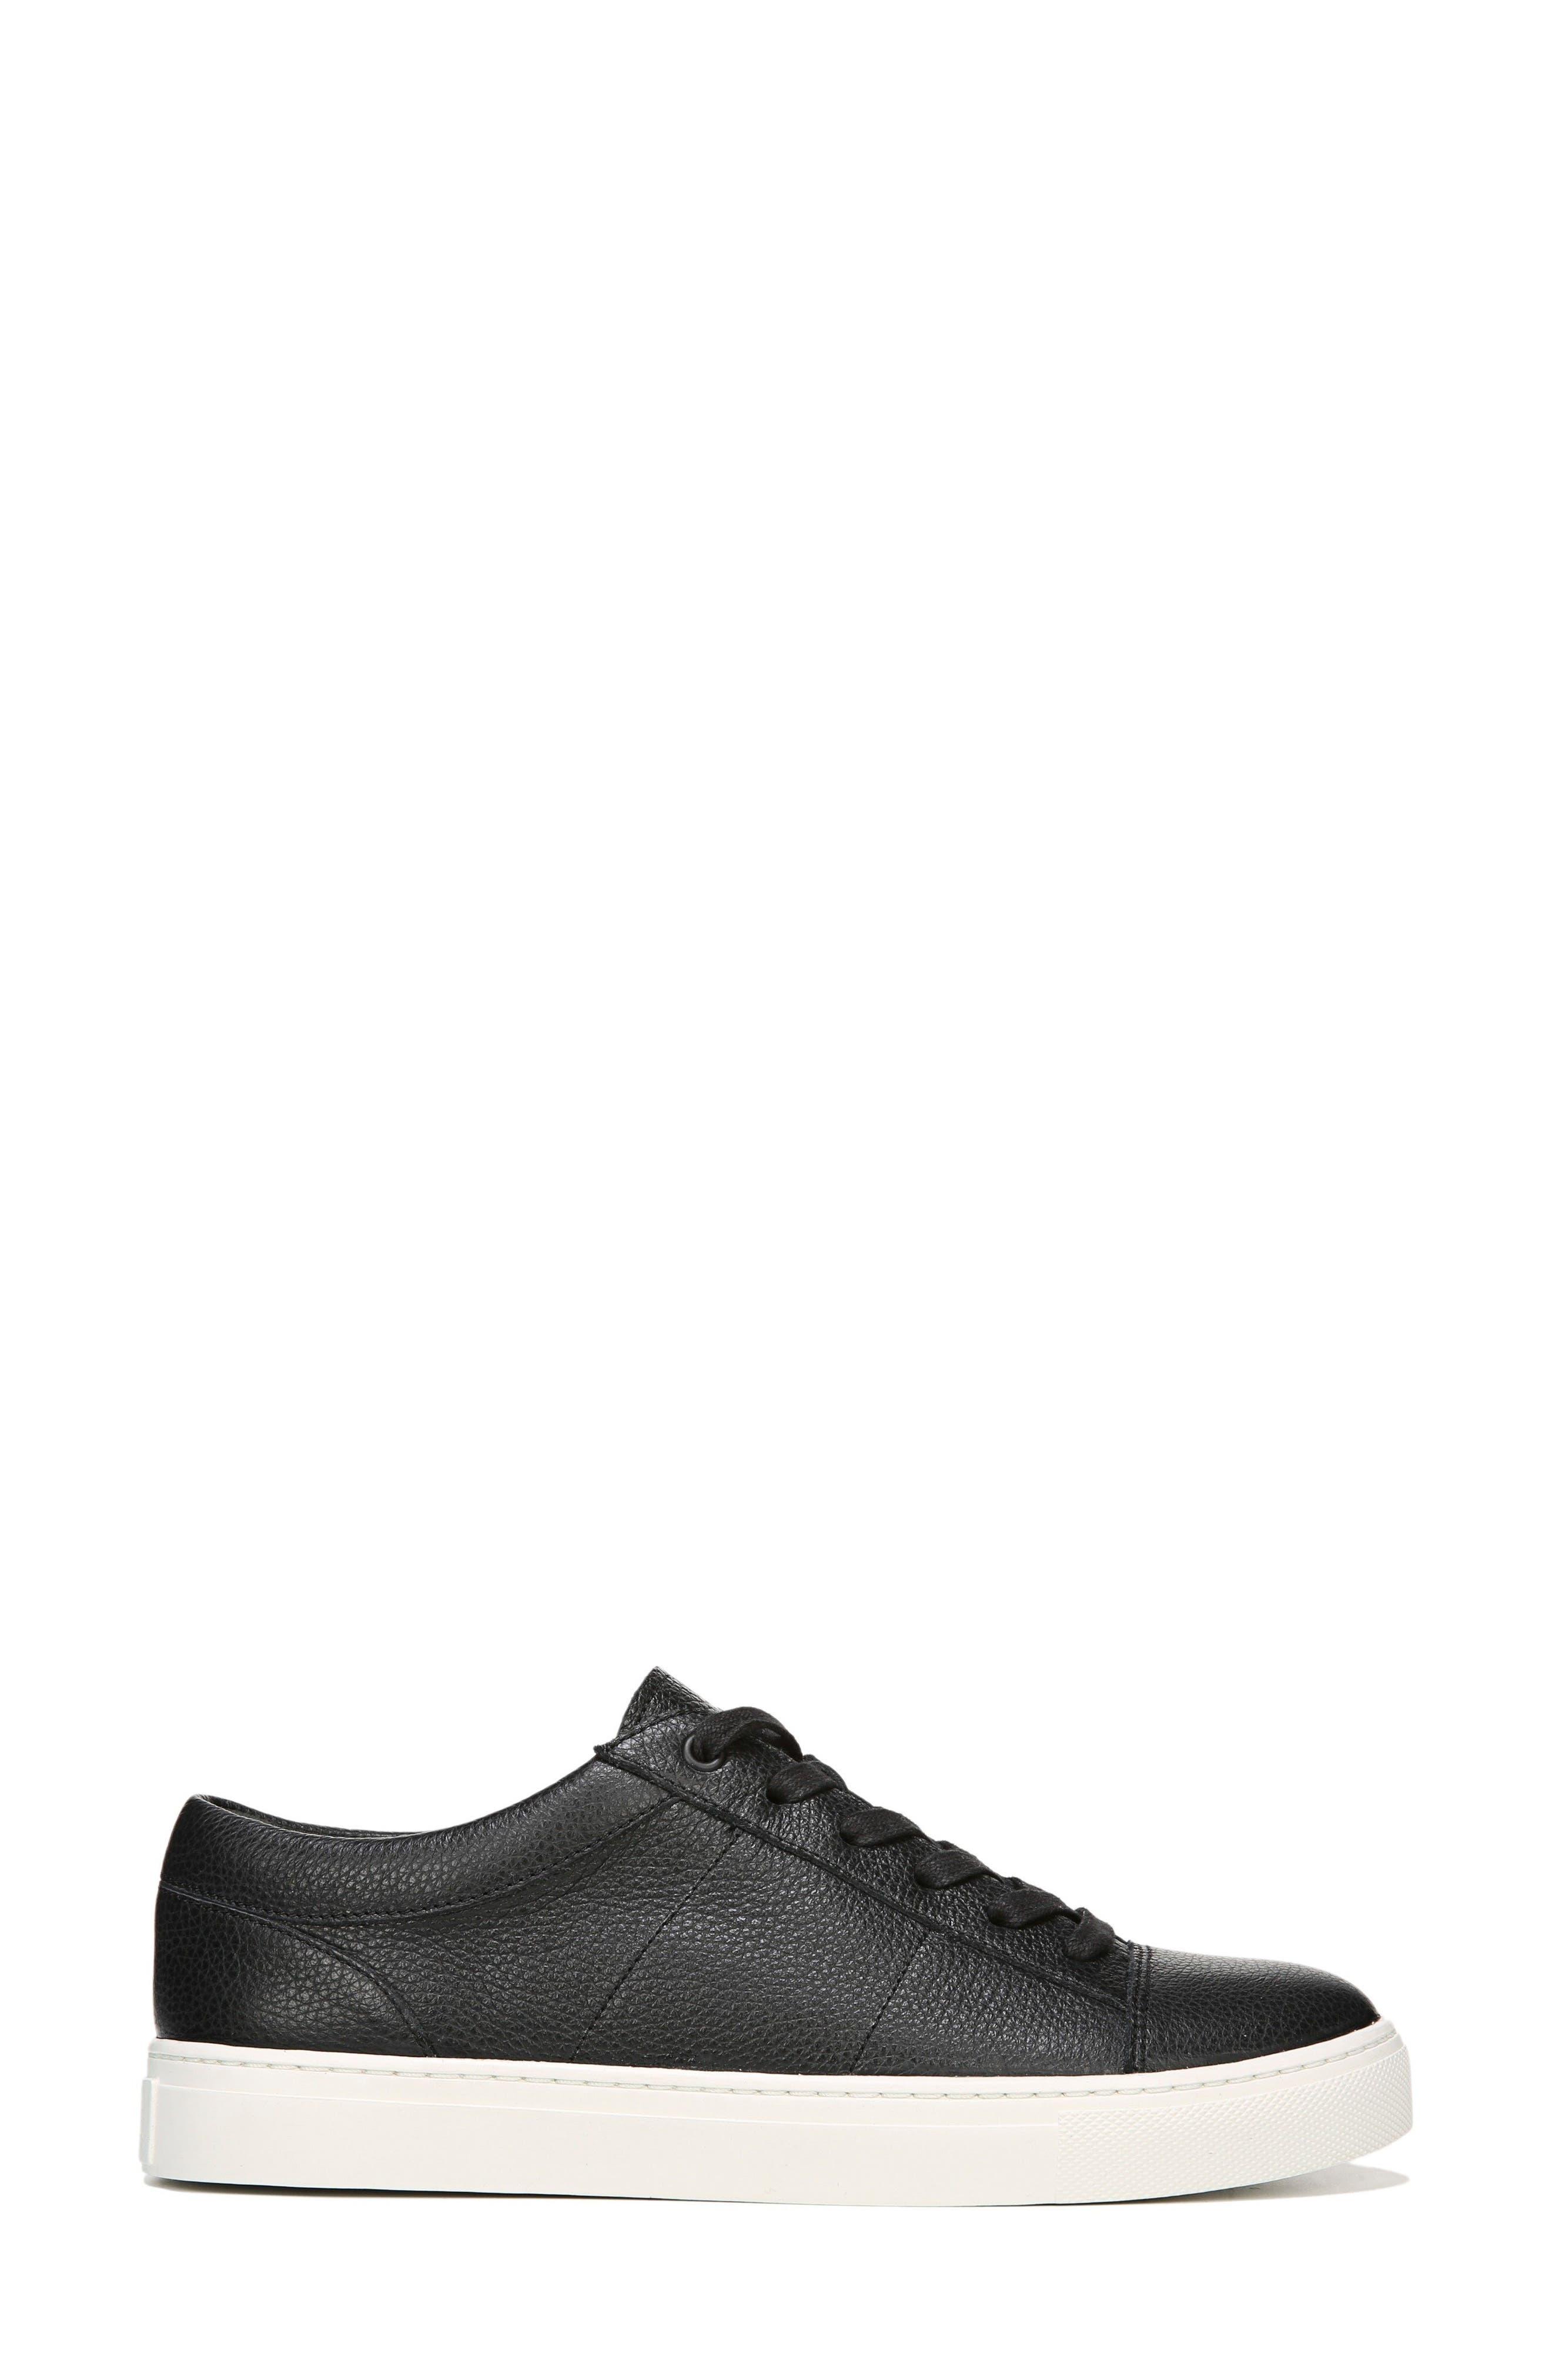 Afton Sneaker,                             Alternate thumbnail 3, color,                             001